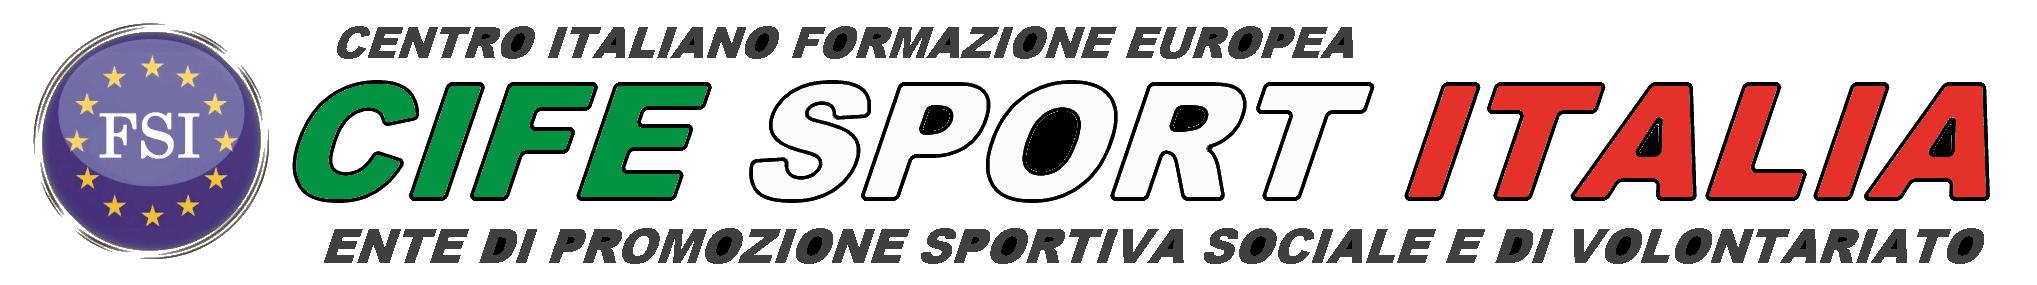 CIFE SPORT ITALIA